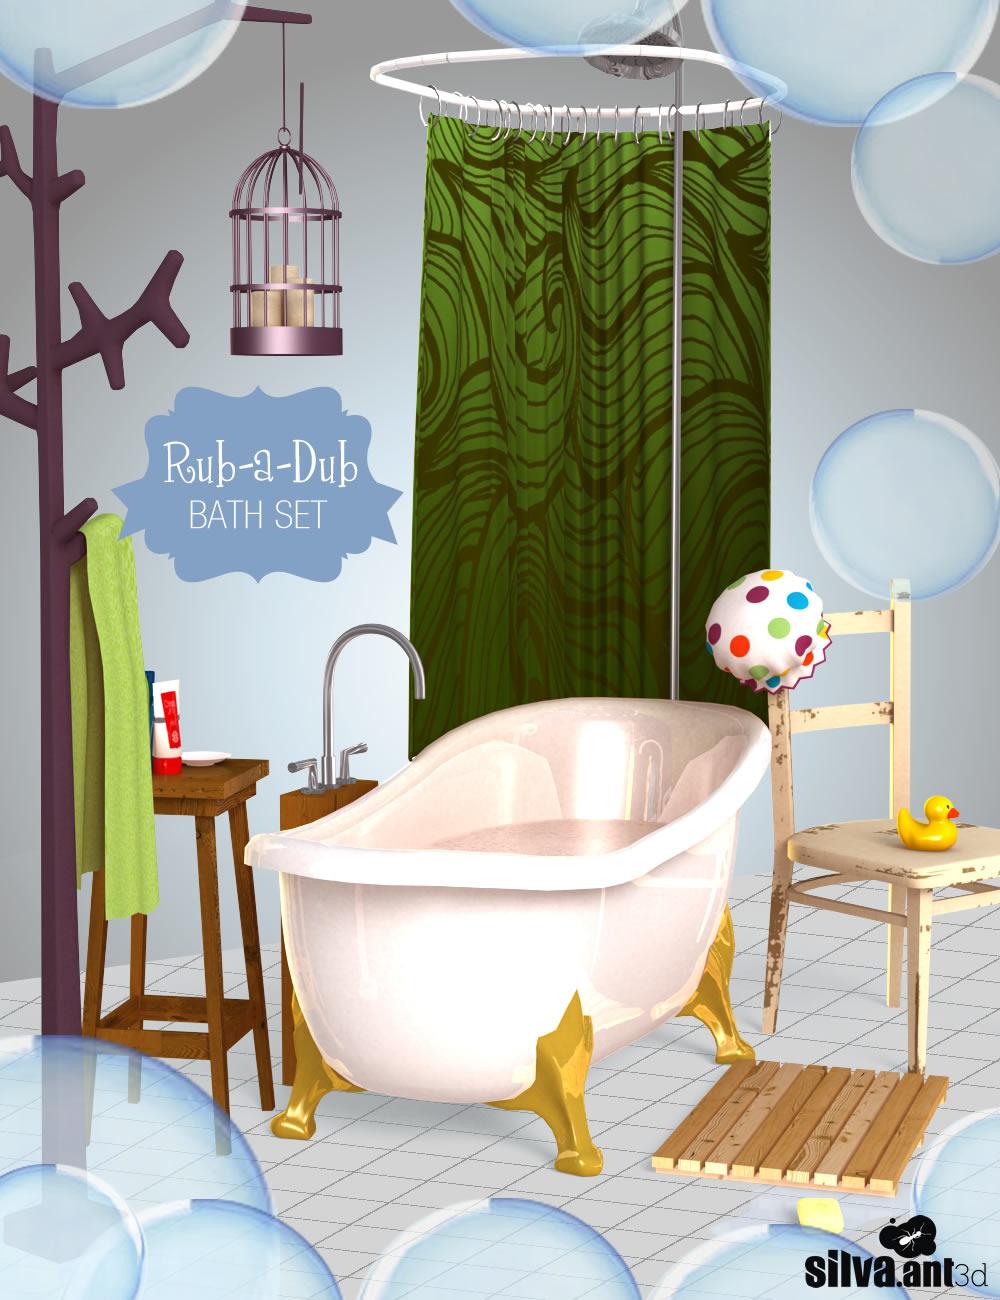 Rub-a-dub Bath Set by: SilvaAnt3d, 3D Models by Daz 3D